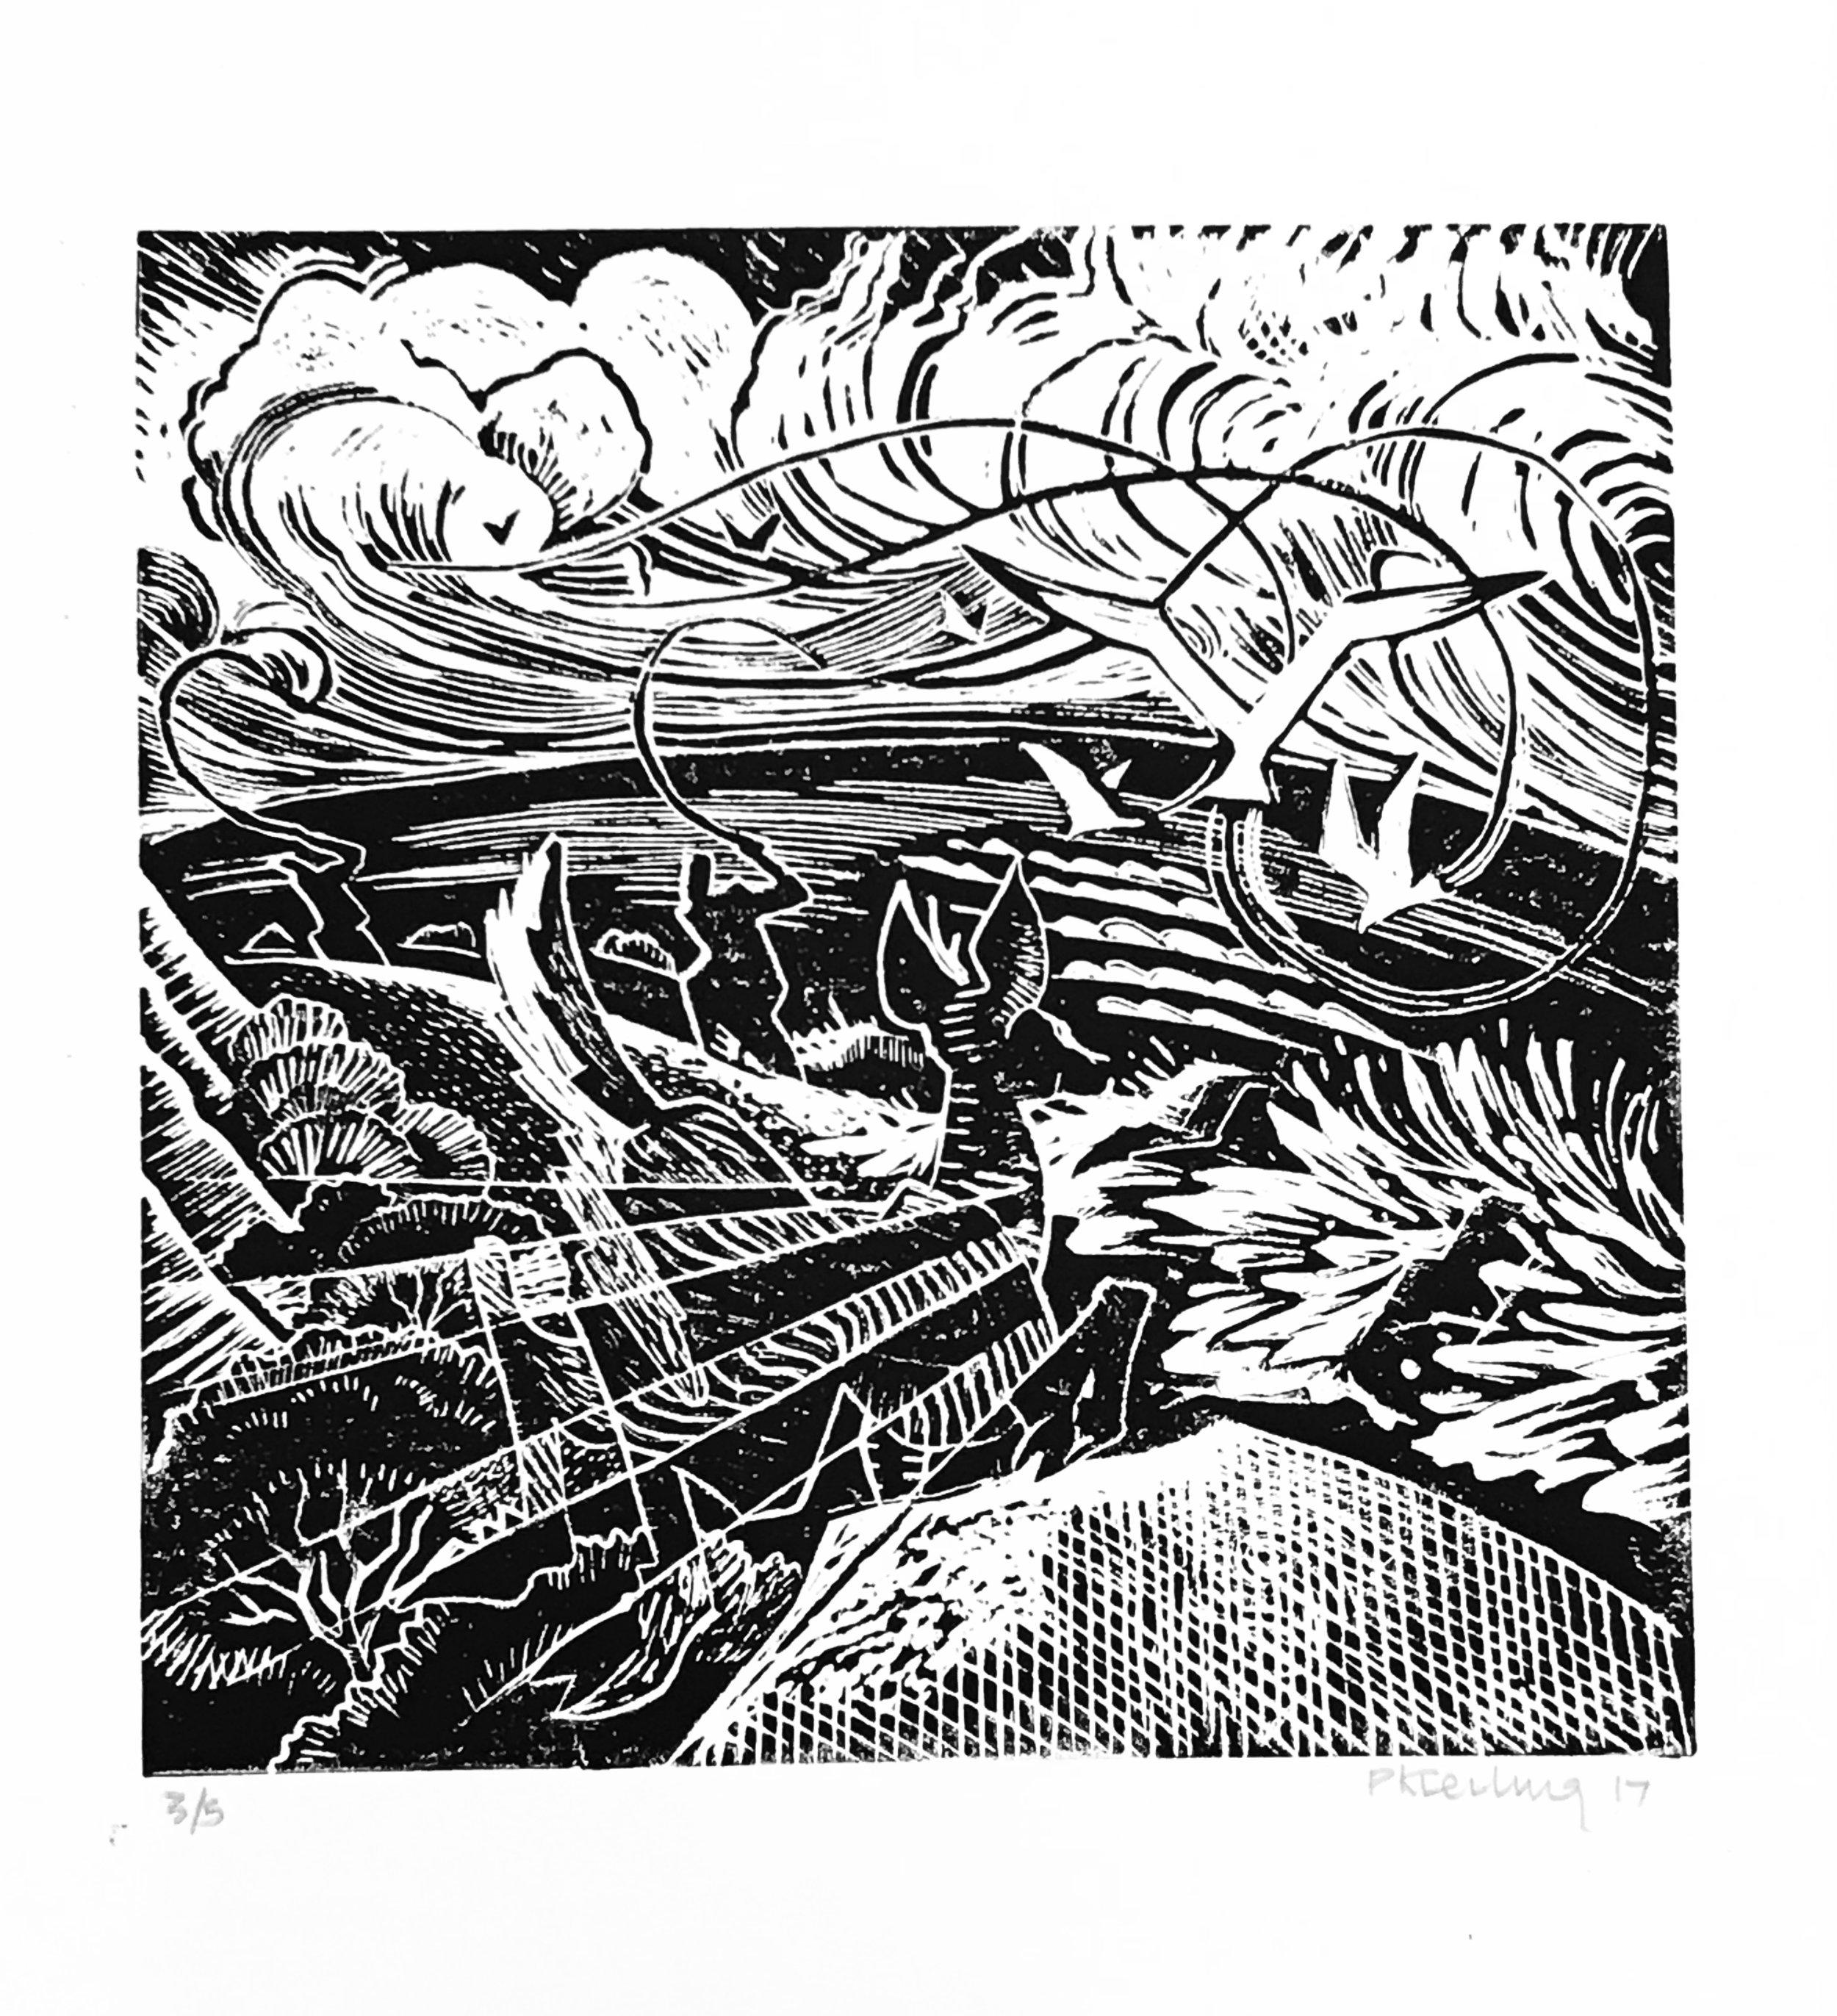 - Paul KreilingFall Run2017Linoleum block printedition of 512 x 12 inches